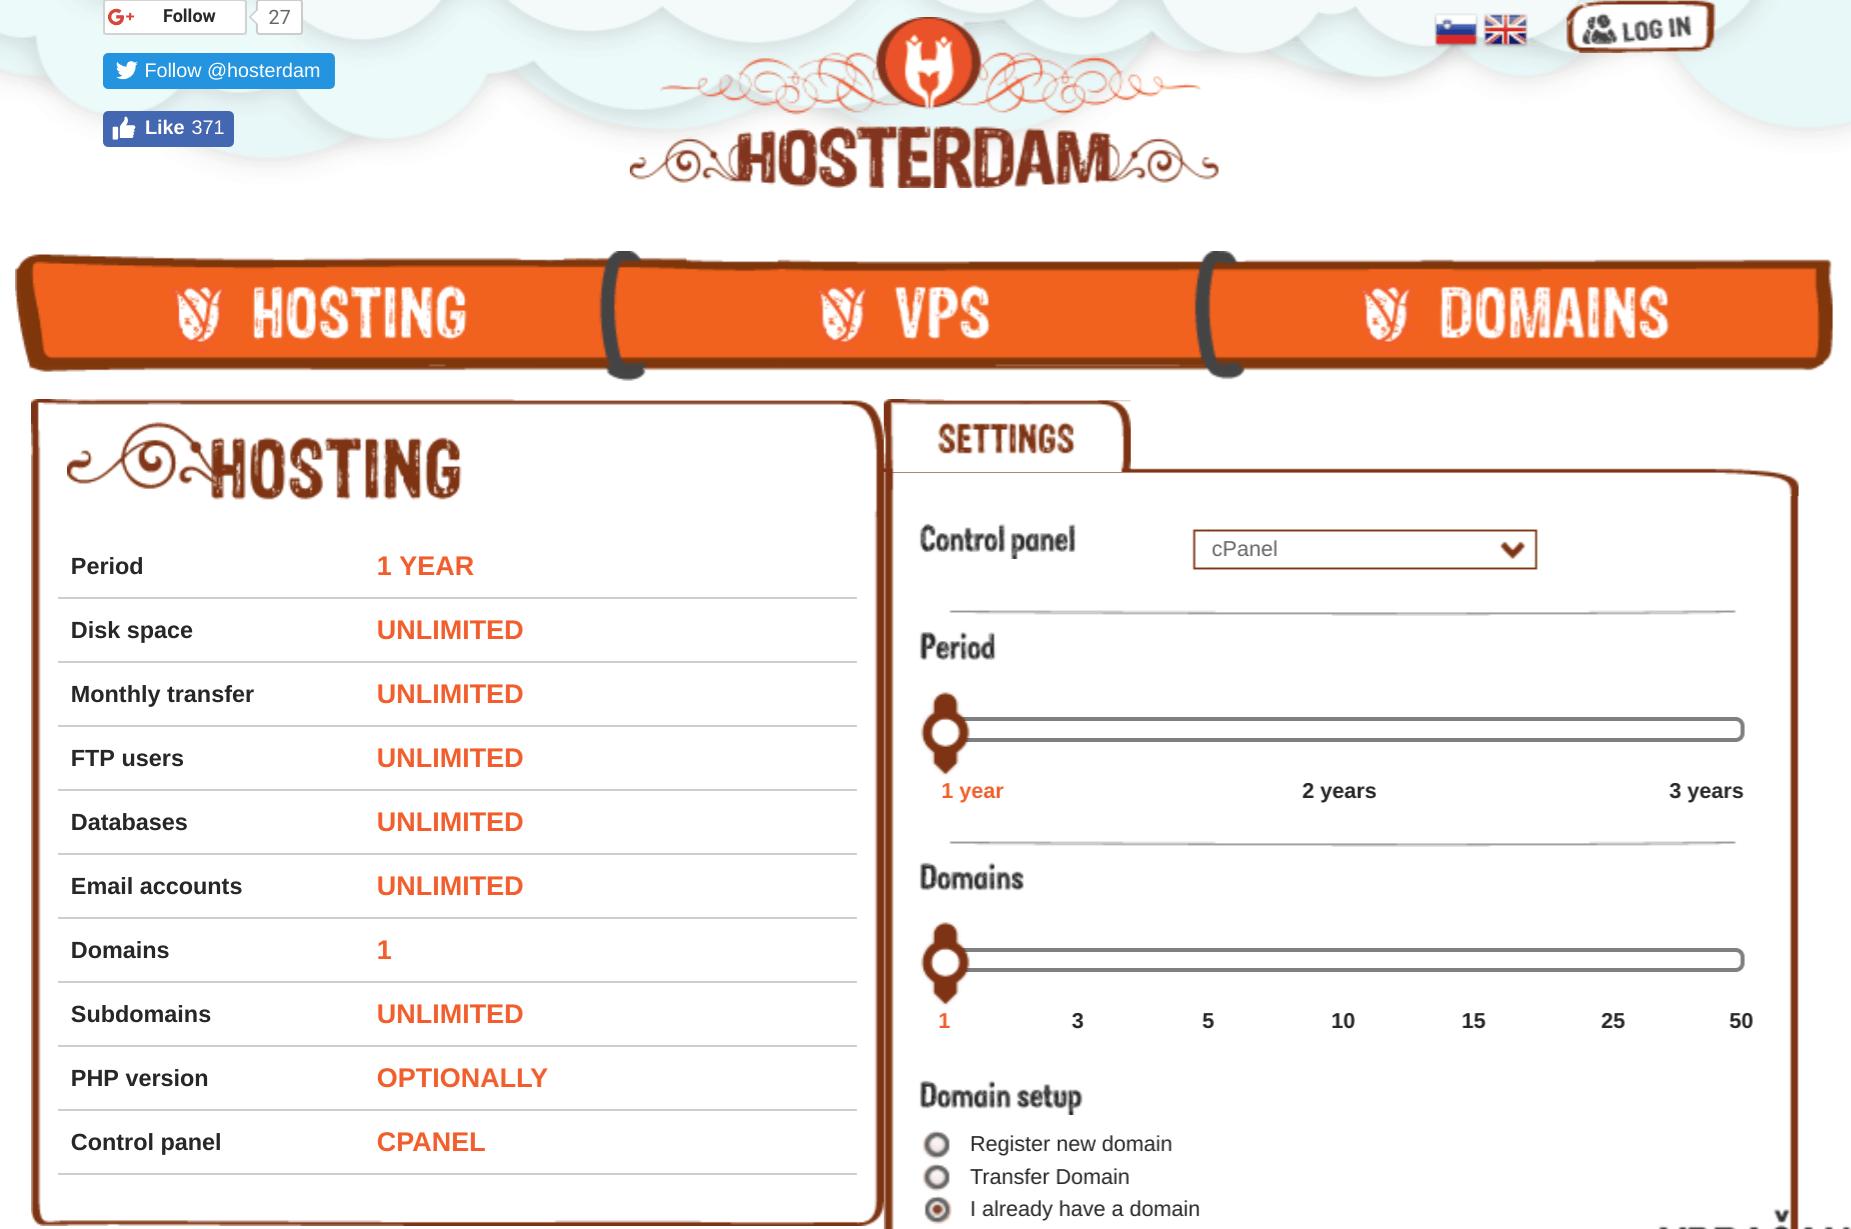 Hosterdam-overview1